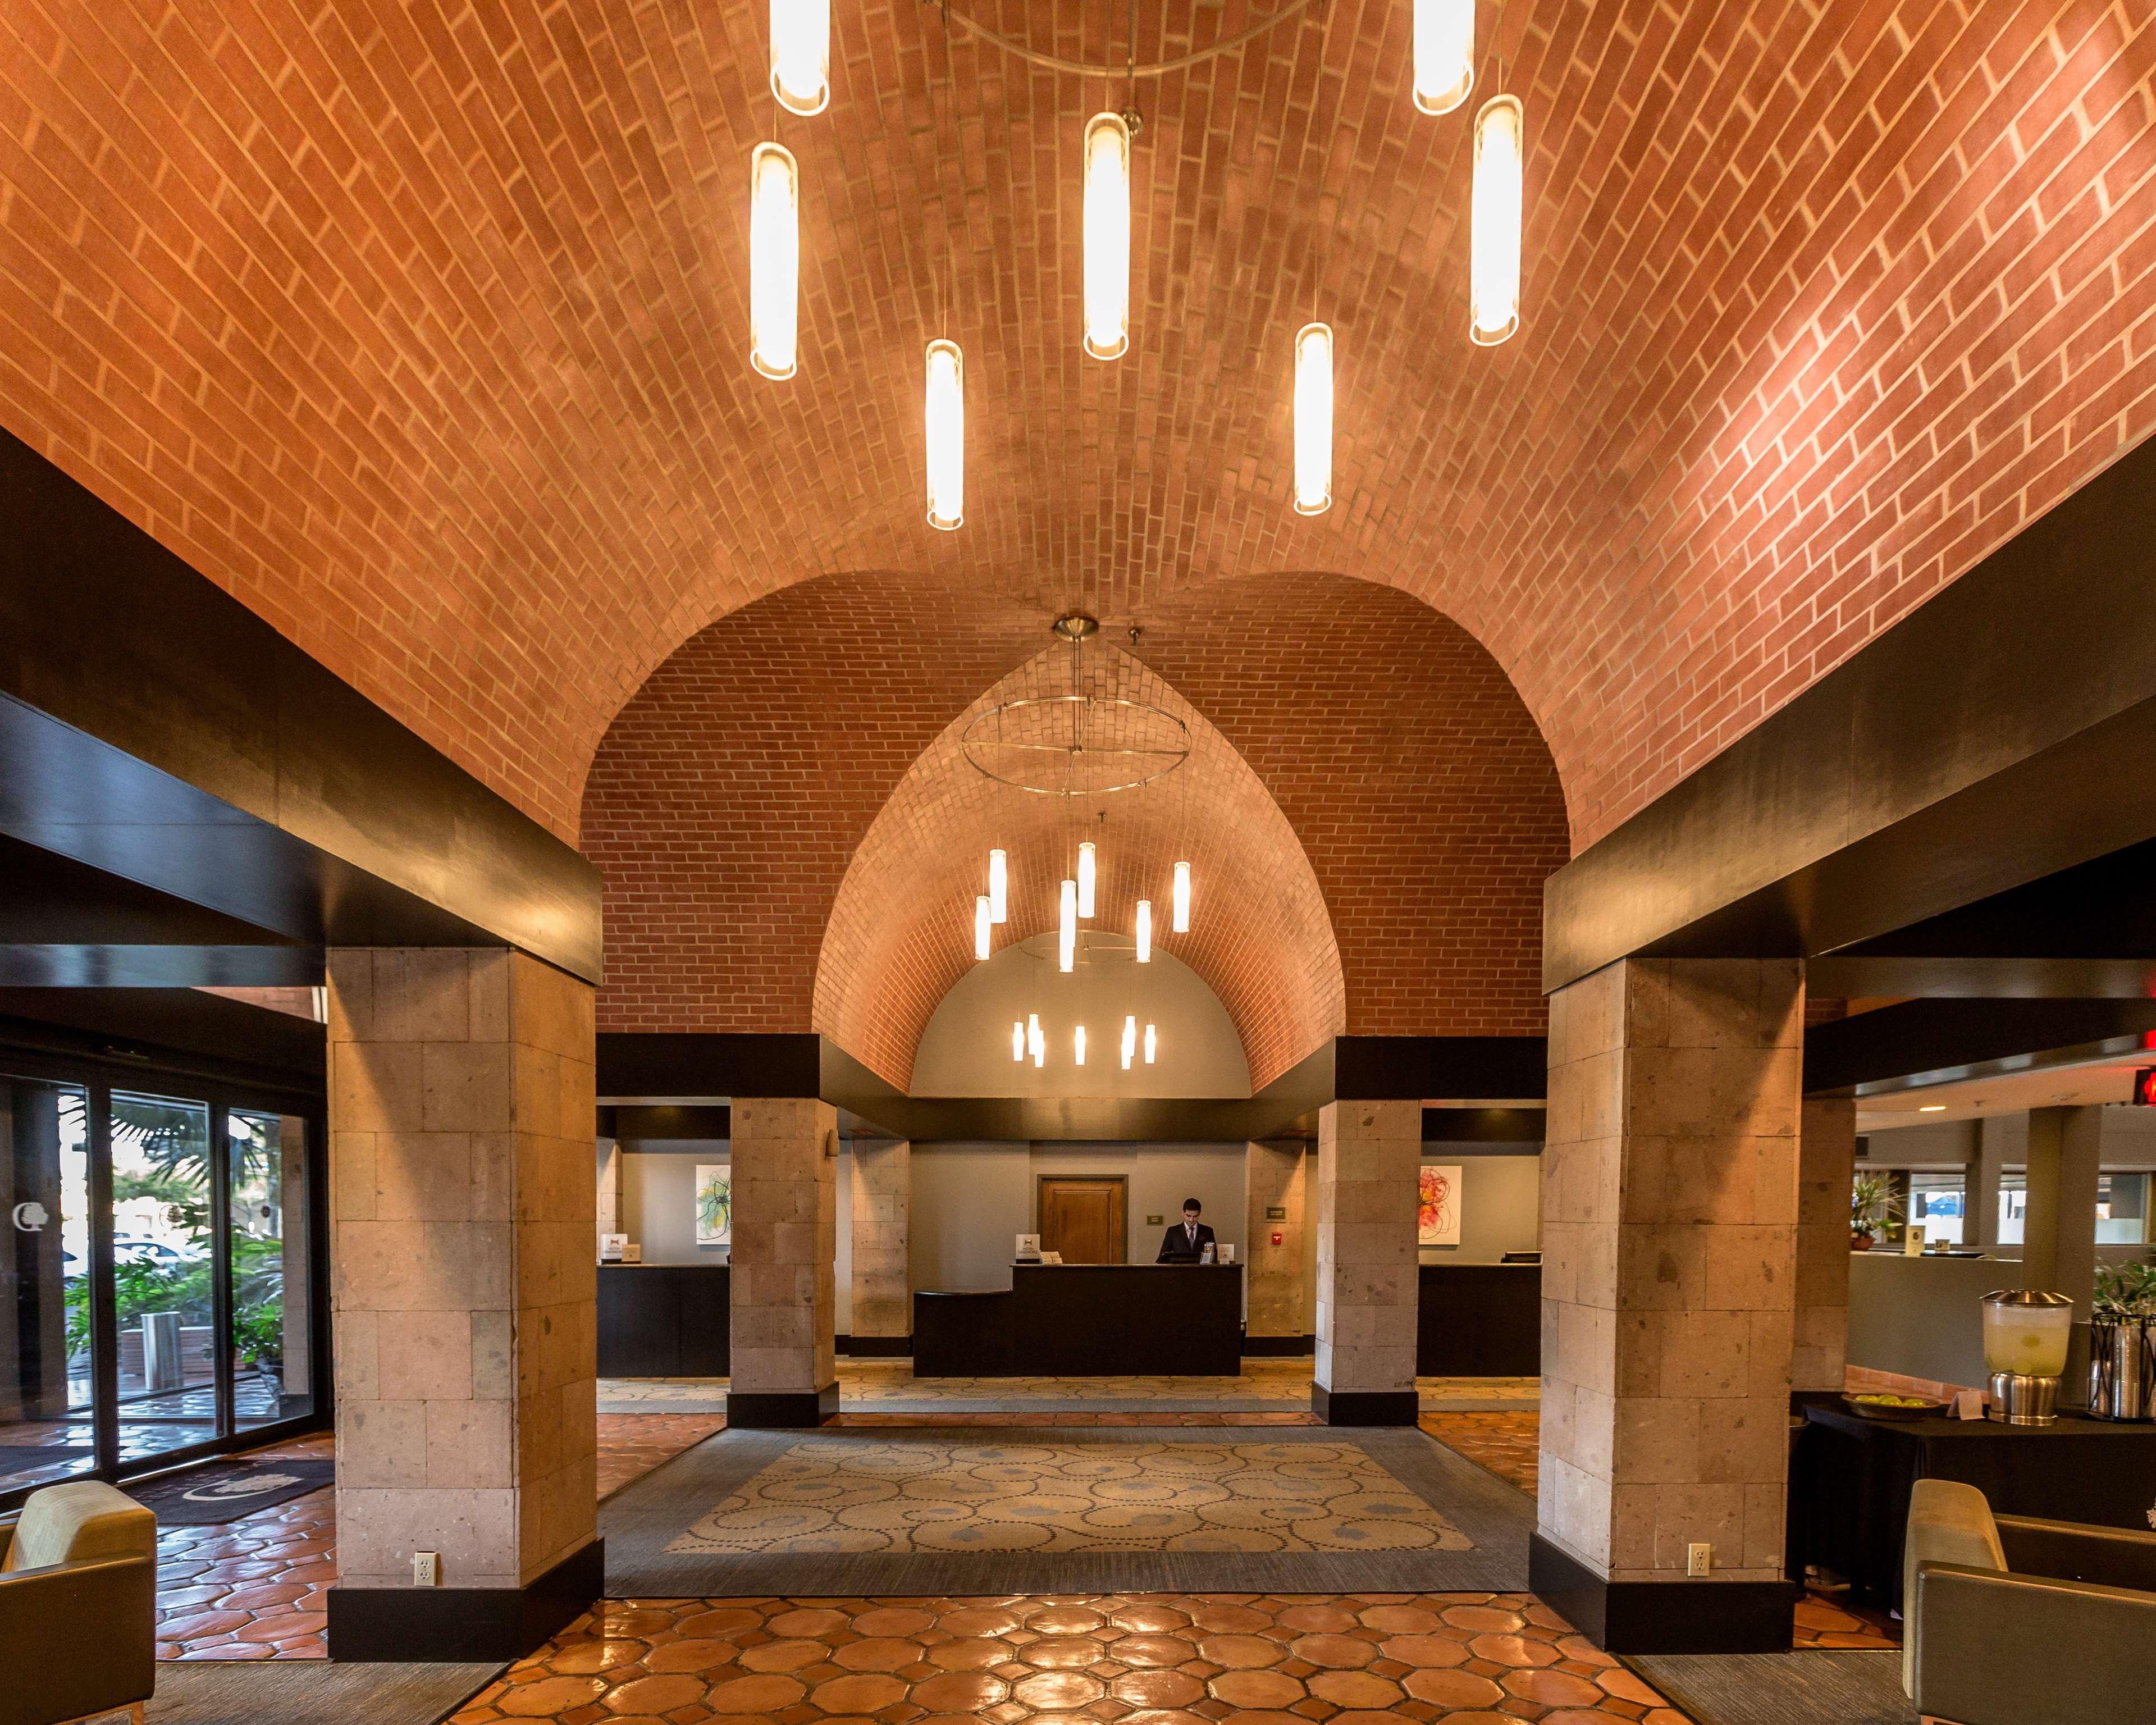 DoubleTree Suites by Hilton Hotel McAllen in McAllen TX